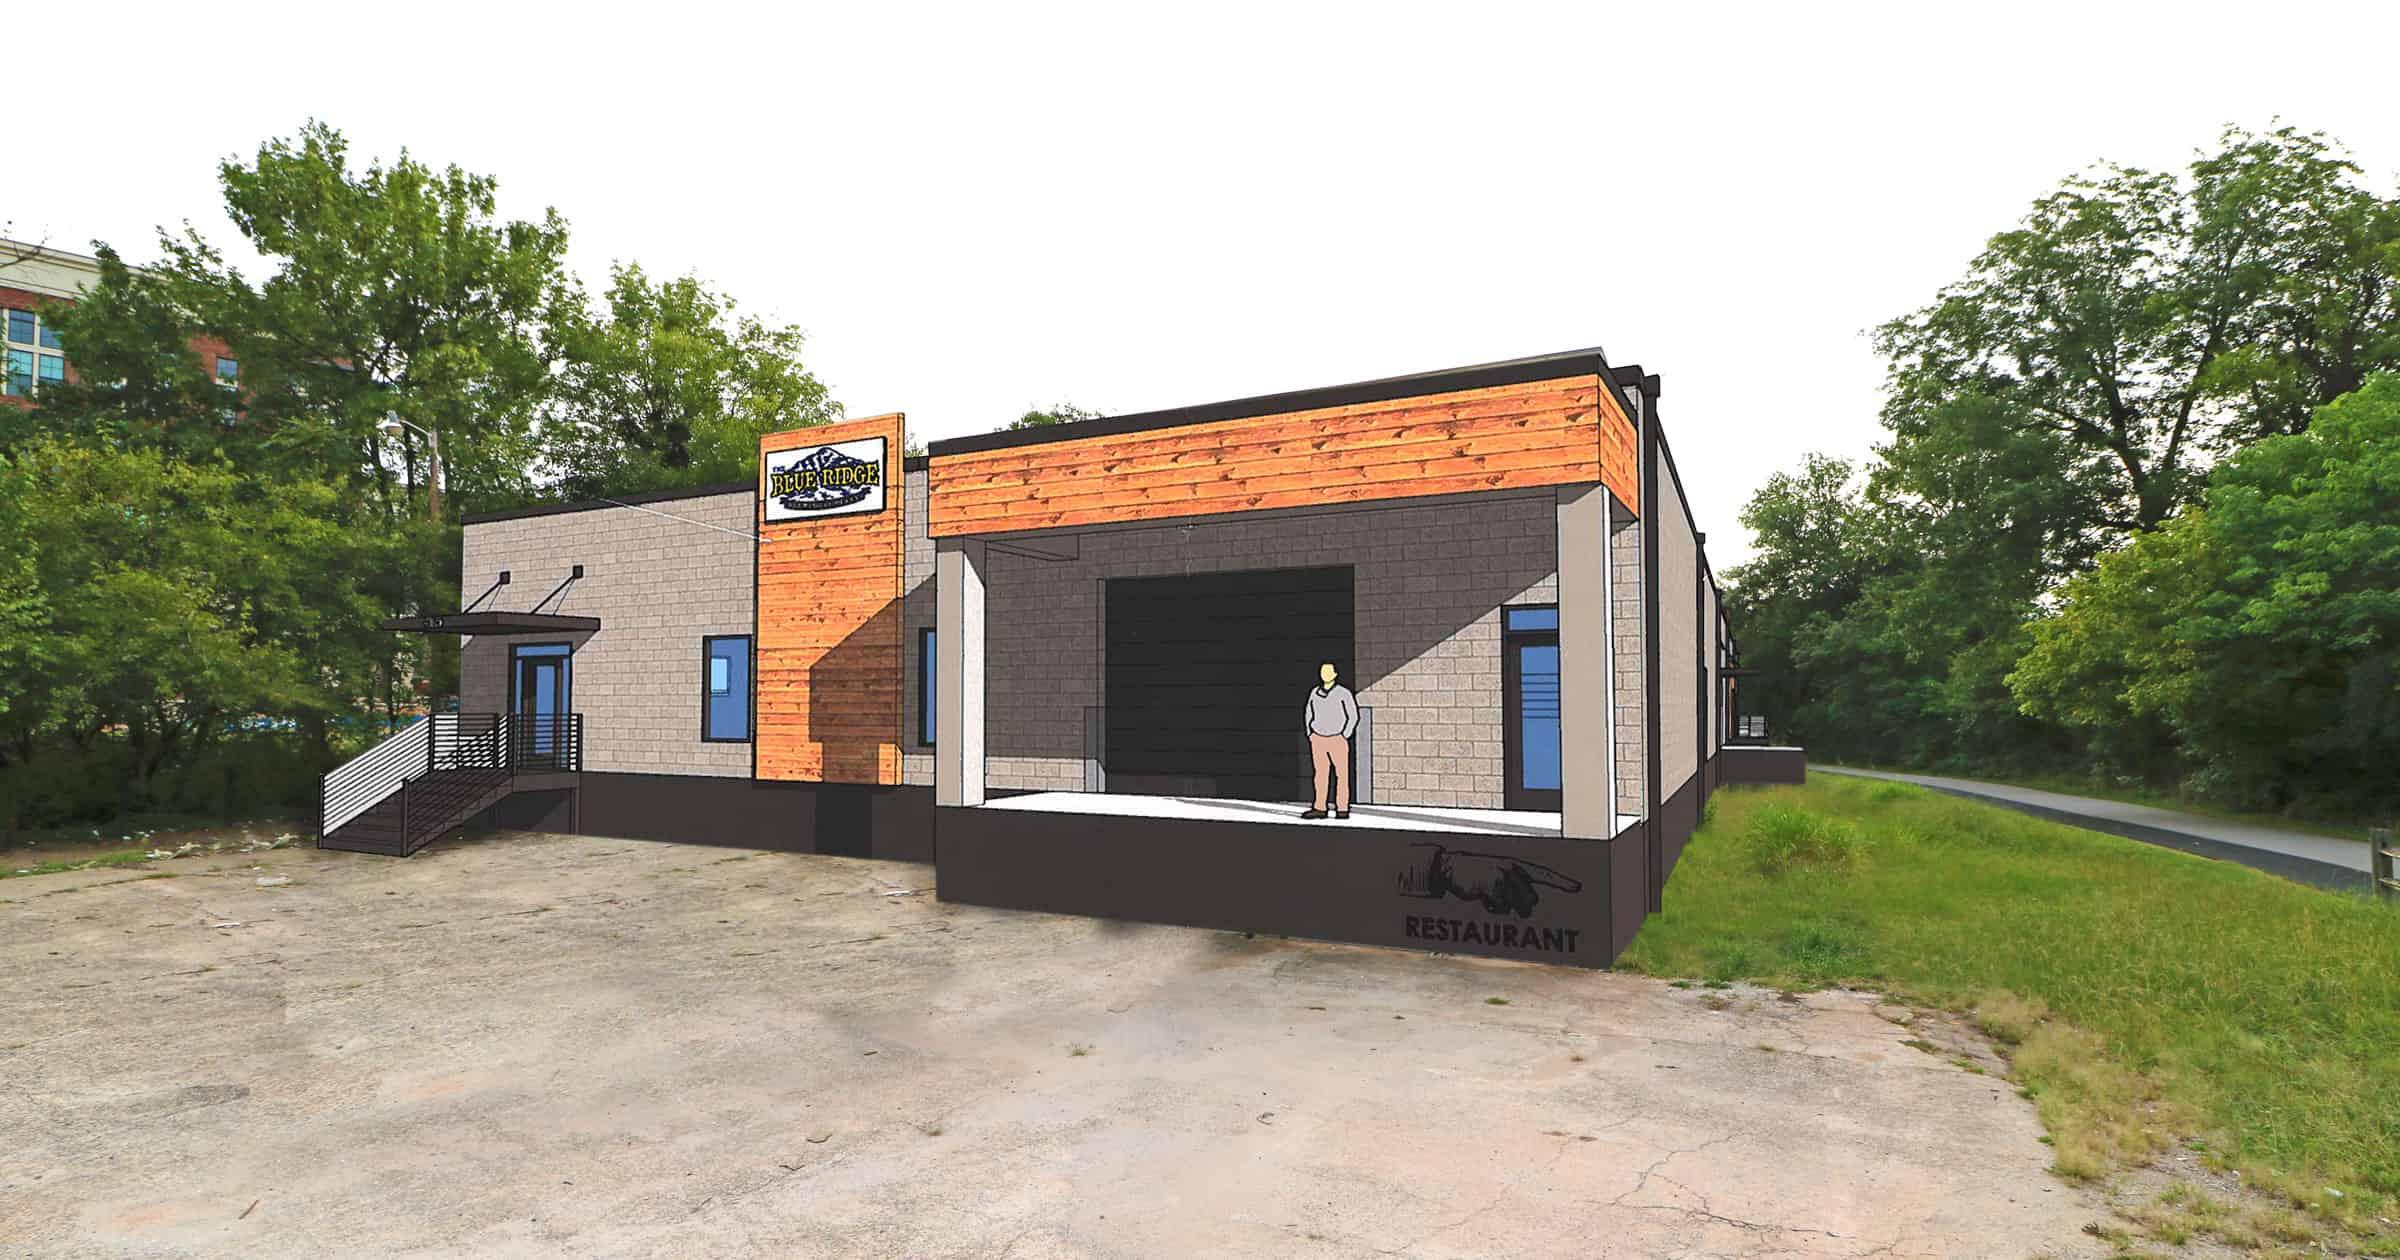 The Blue Ridge Brewing Company